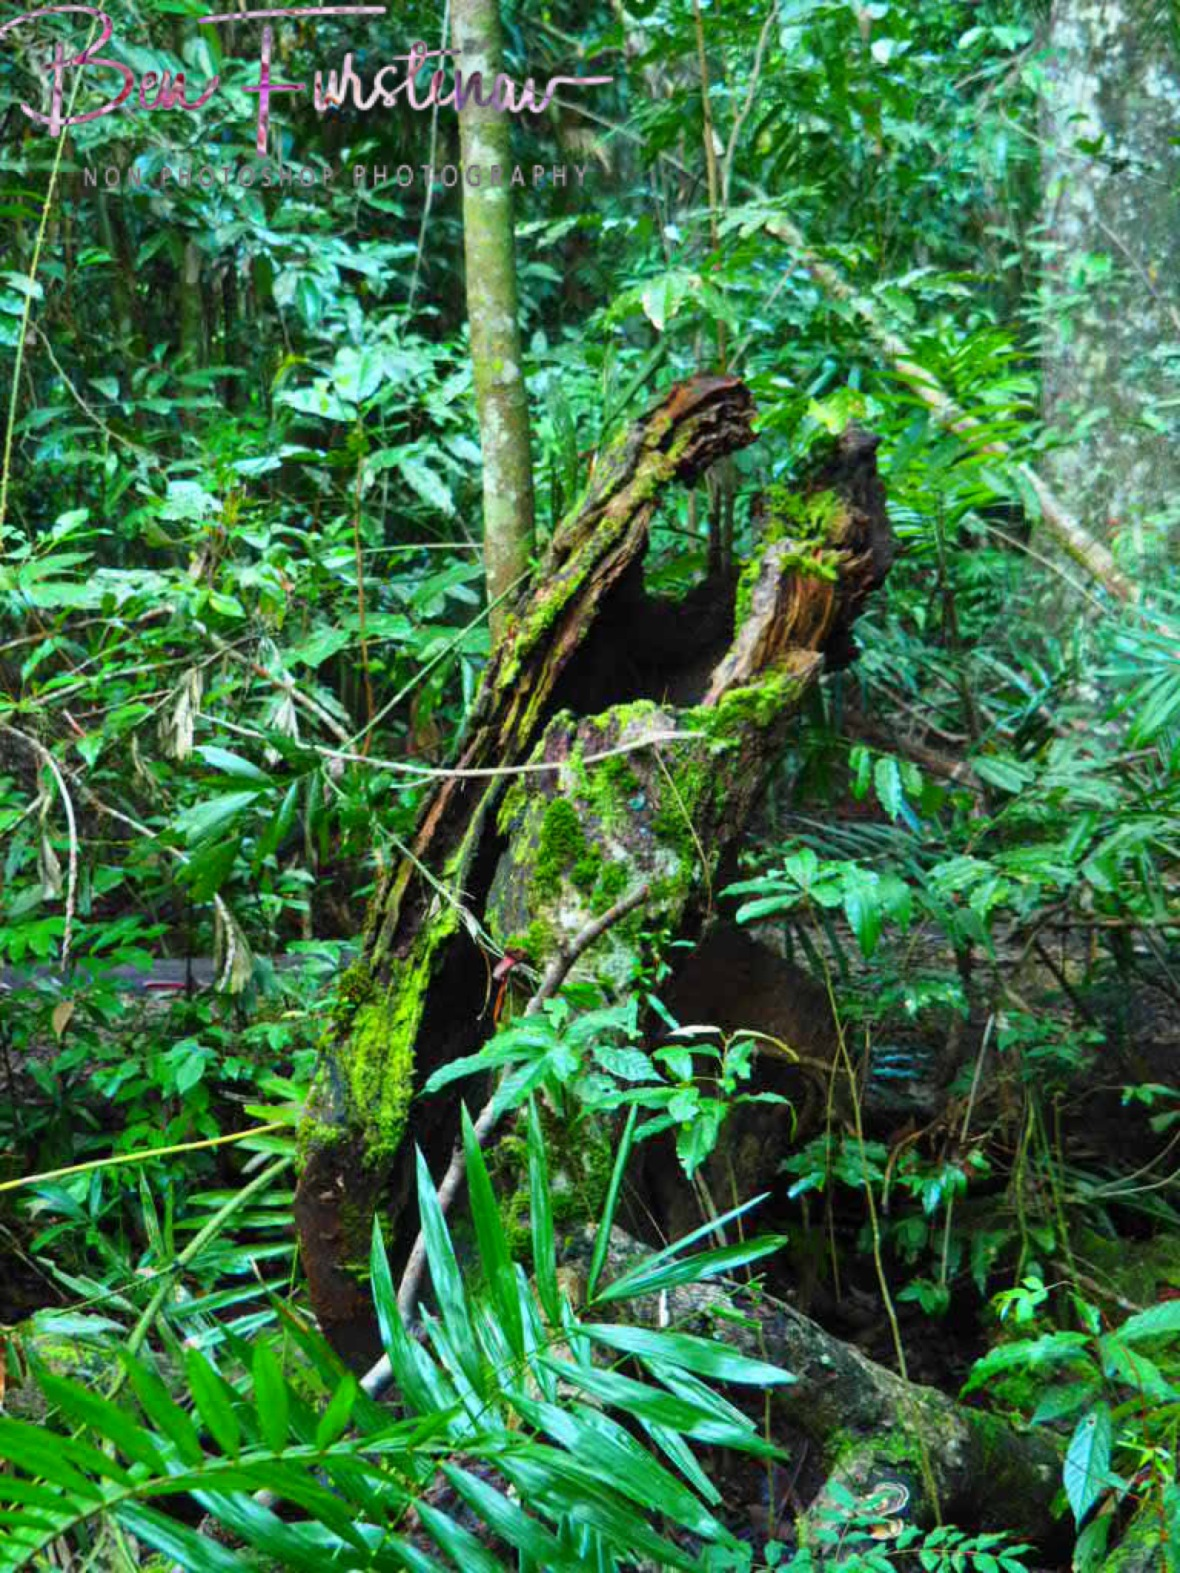 Endangered Mabi forest at Atherton Tablelands, Far North Queensland, Australia